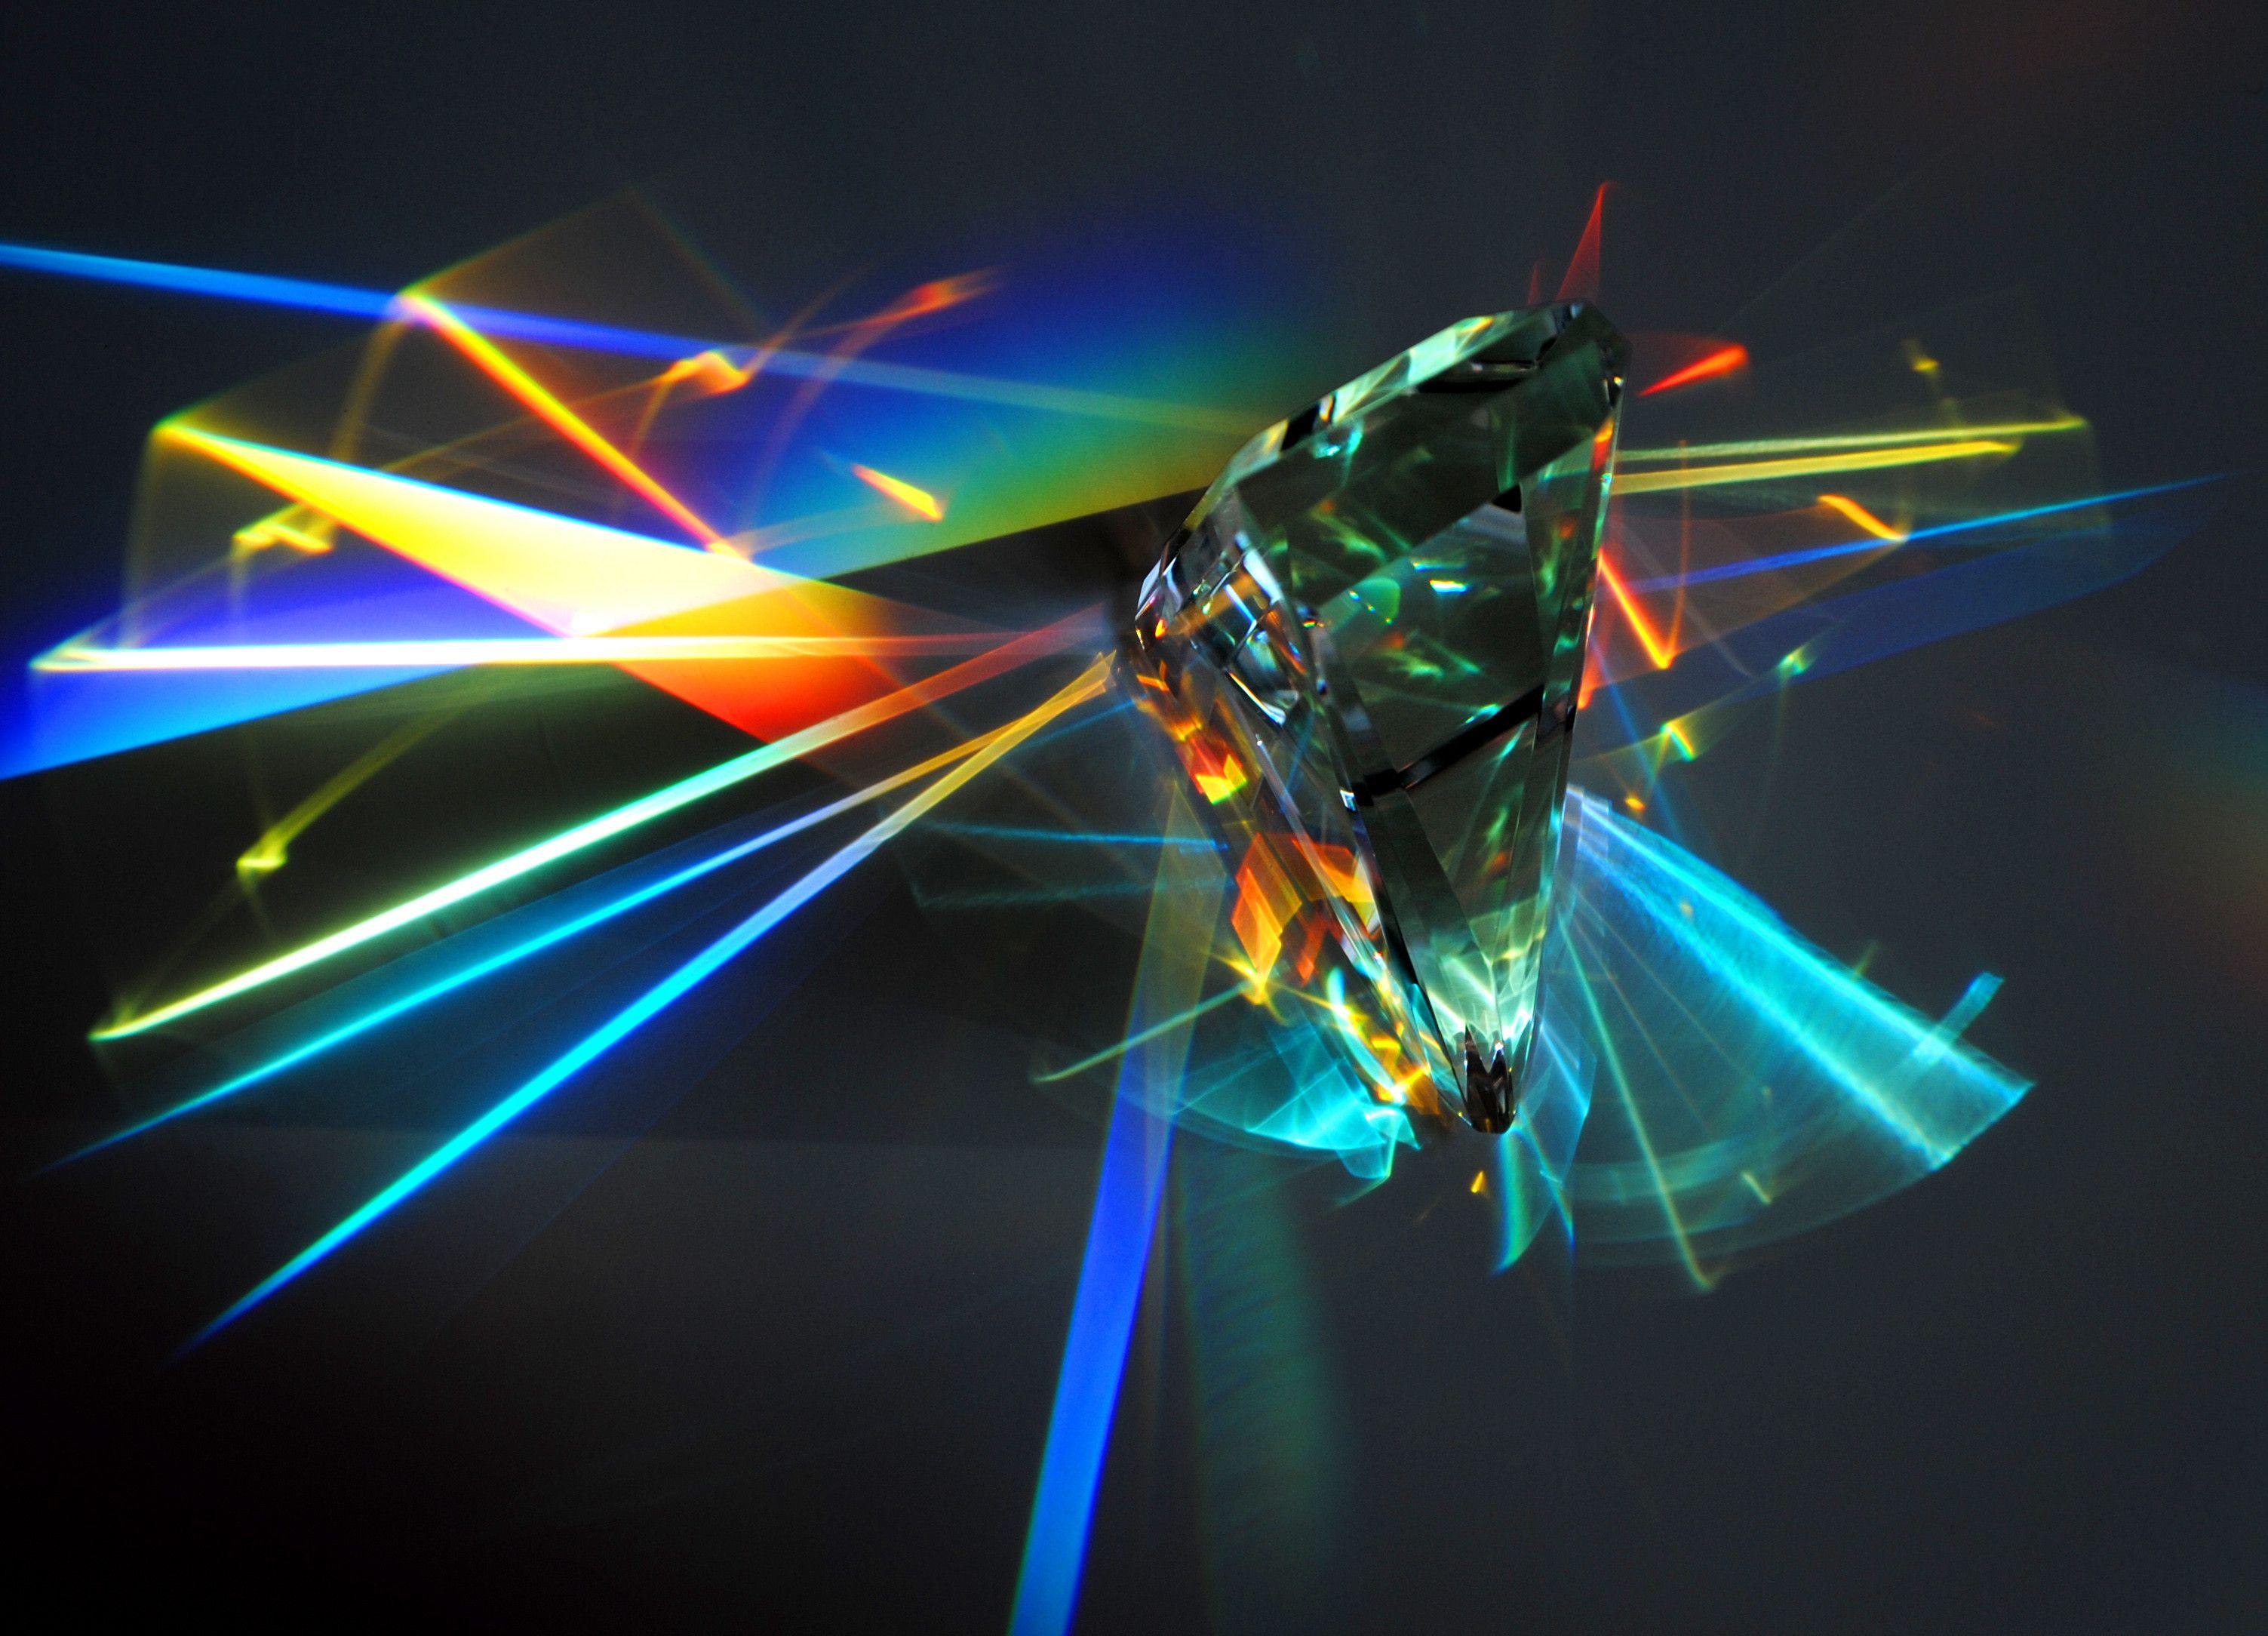 crystal prism - Pesquisa Google   referência (brilho em luz)   Pinterest